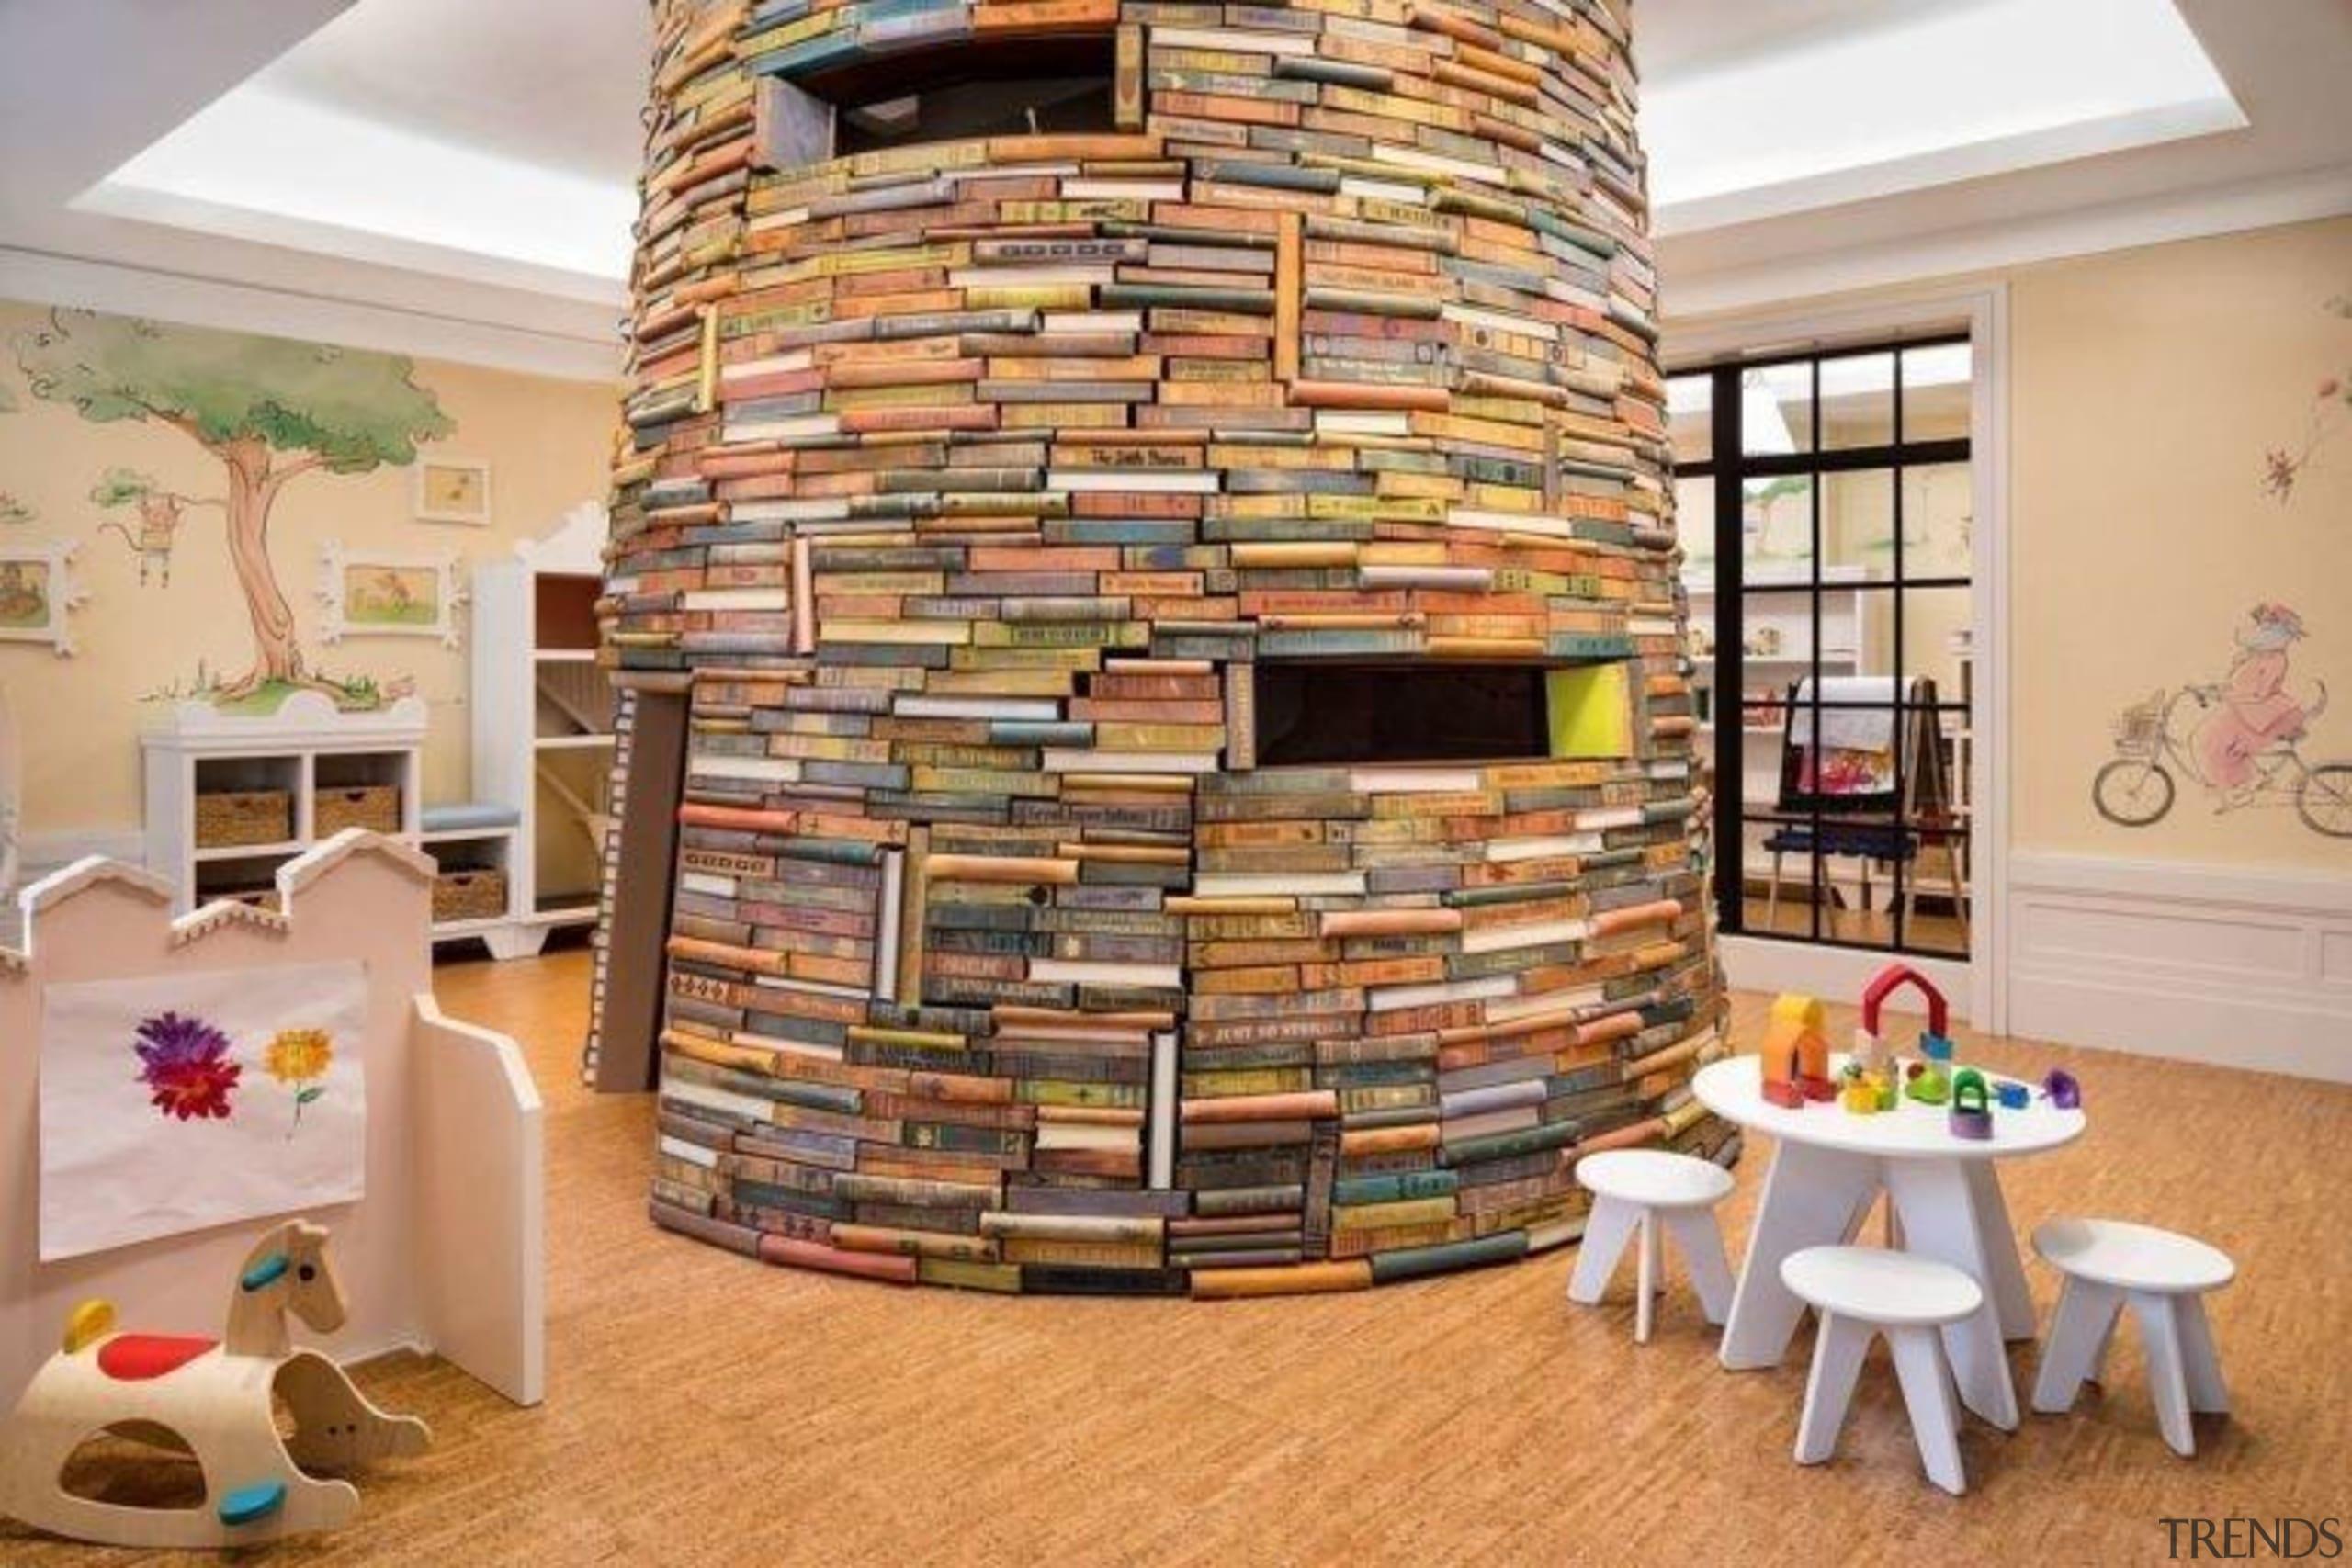 Jon Bon Jovi's new apartment in NYC – flooring, interior design, living room, wall, orange, gray